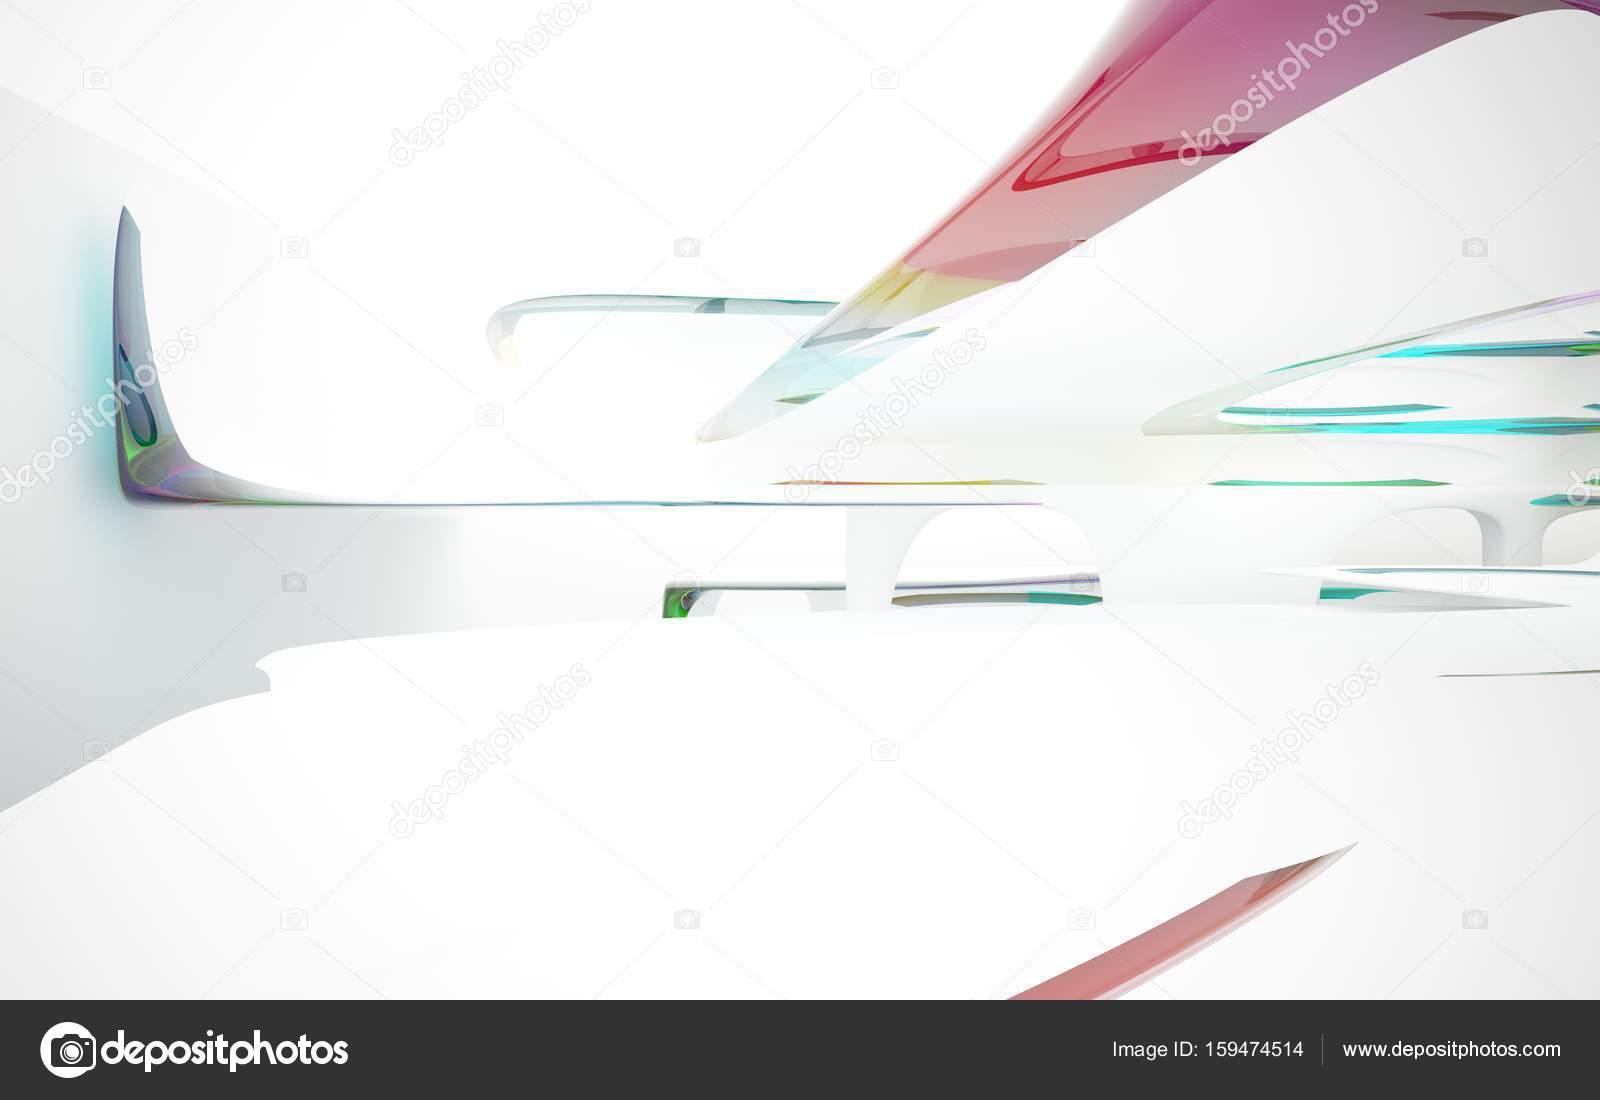 Dinámica Interior Con Objetos Lisos Foto De Stock Sergeymansurov